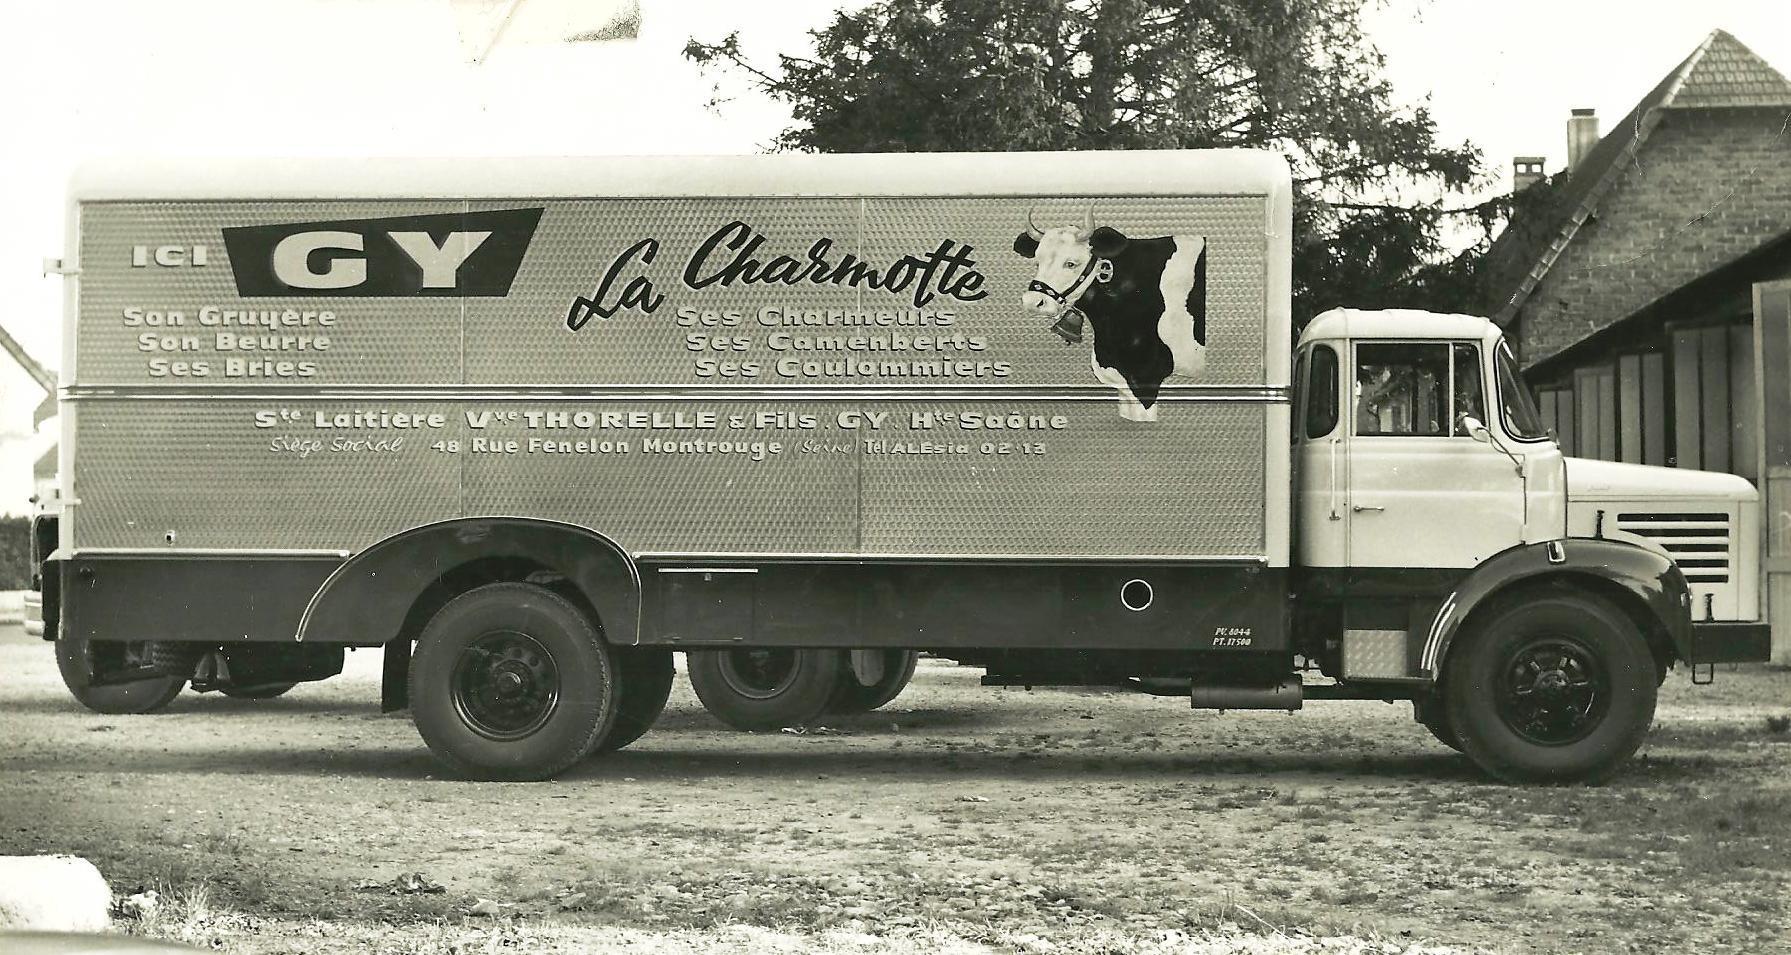 La Charmotte